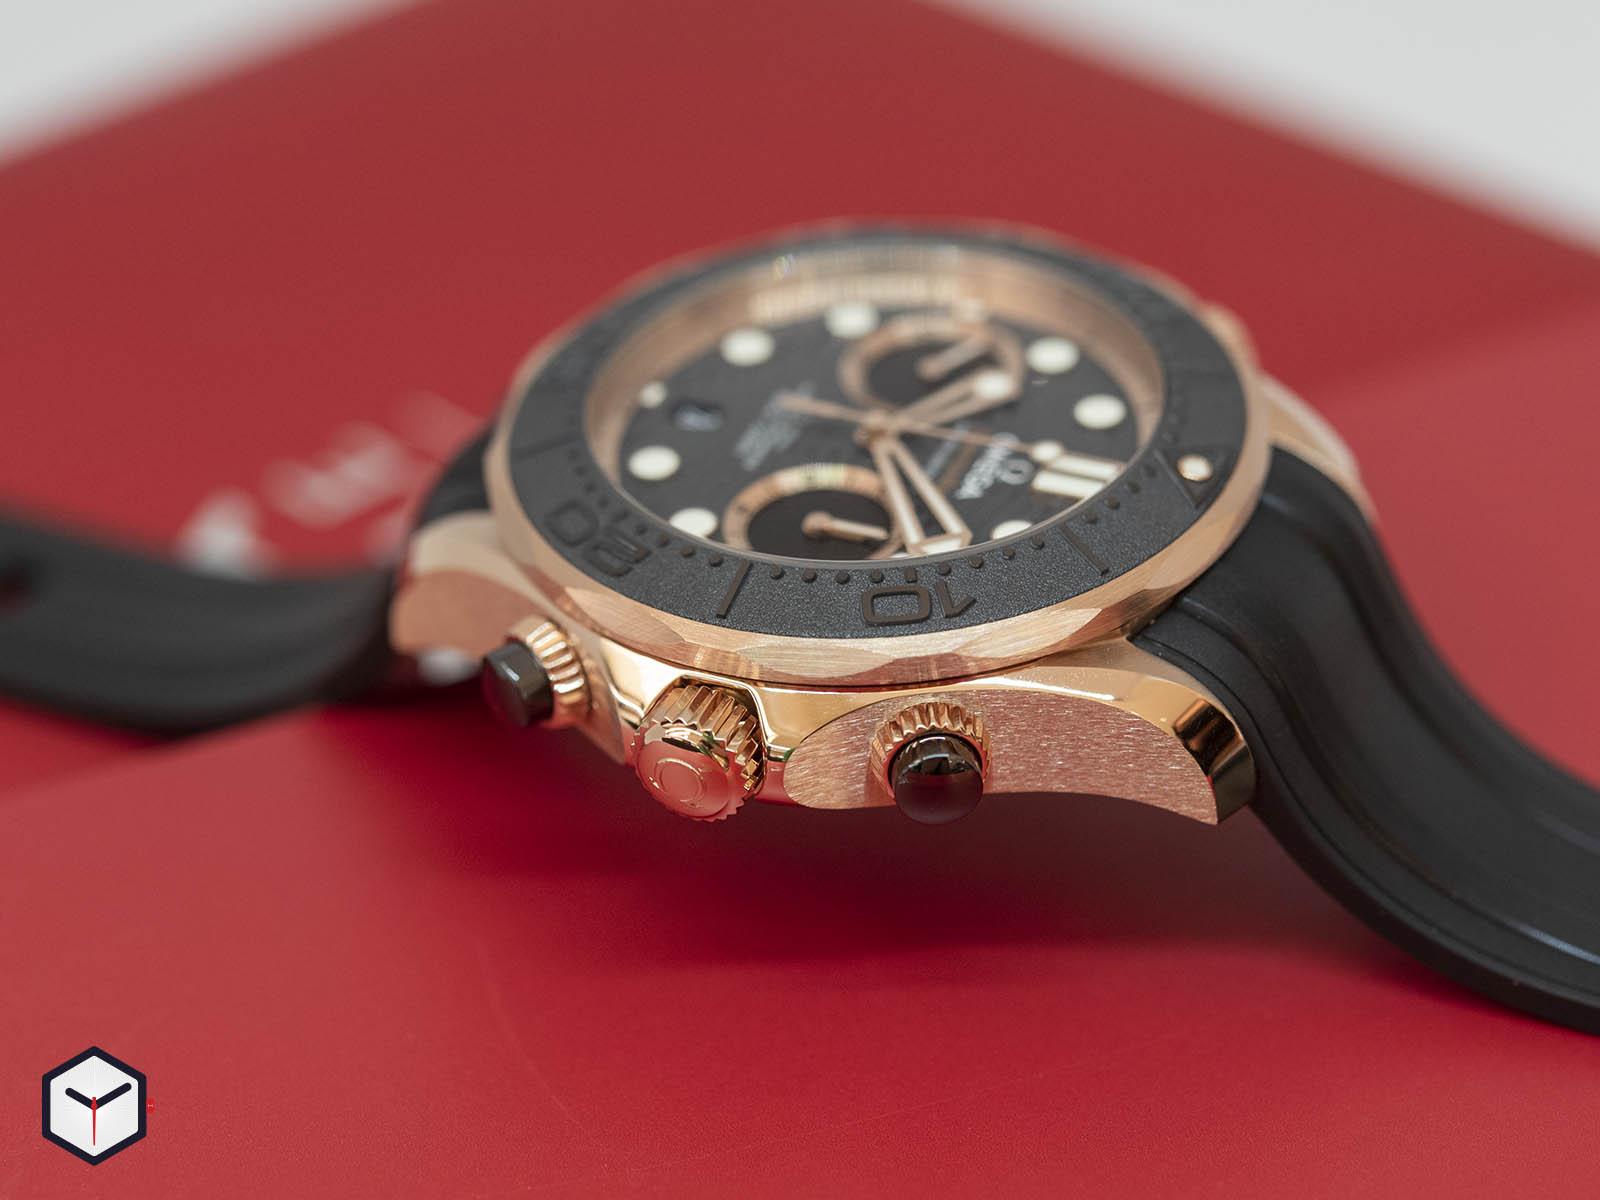 210-62-44-51-01-001-omega-seamaster-diver-300m-co-axial-master-chronometer-chronograph-3.jpg